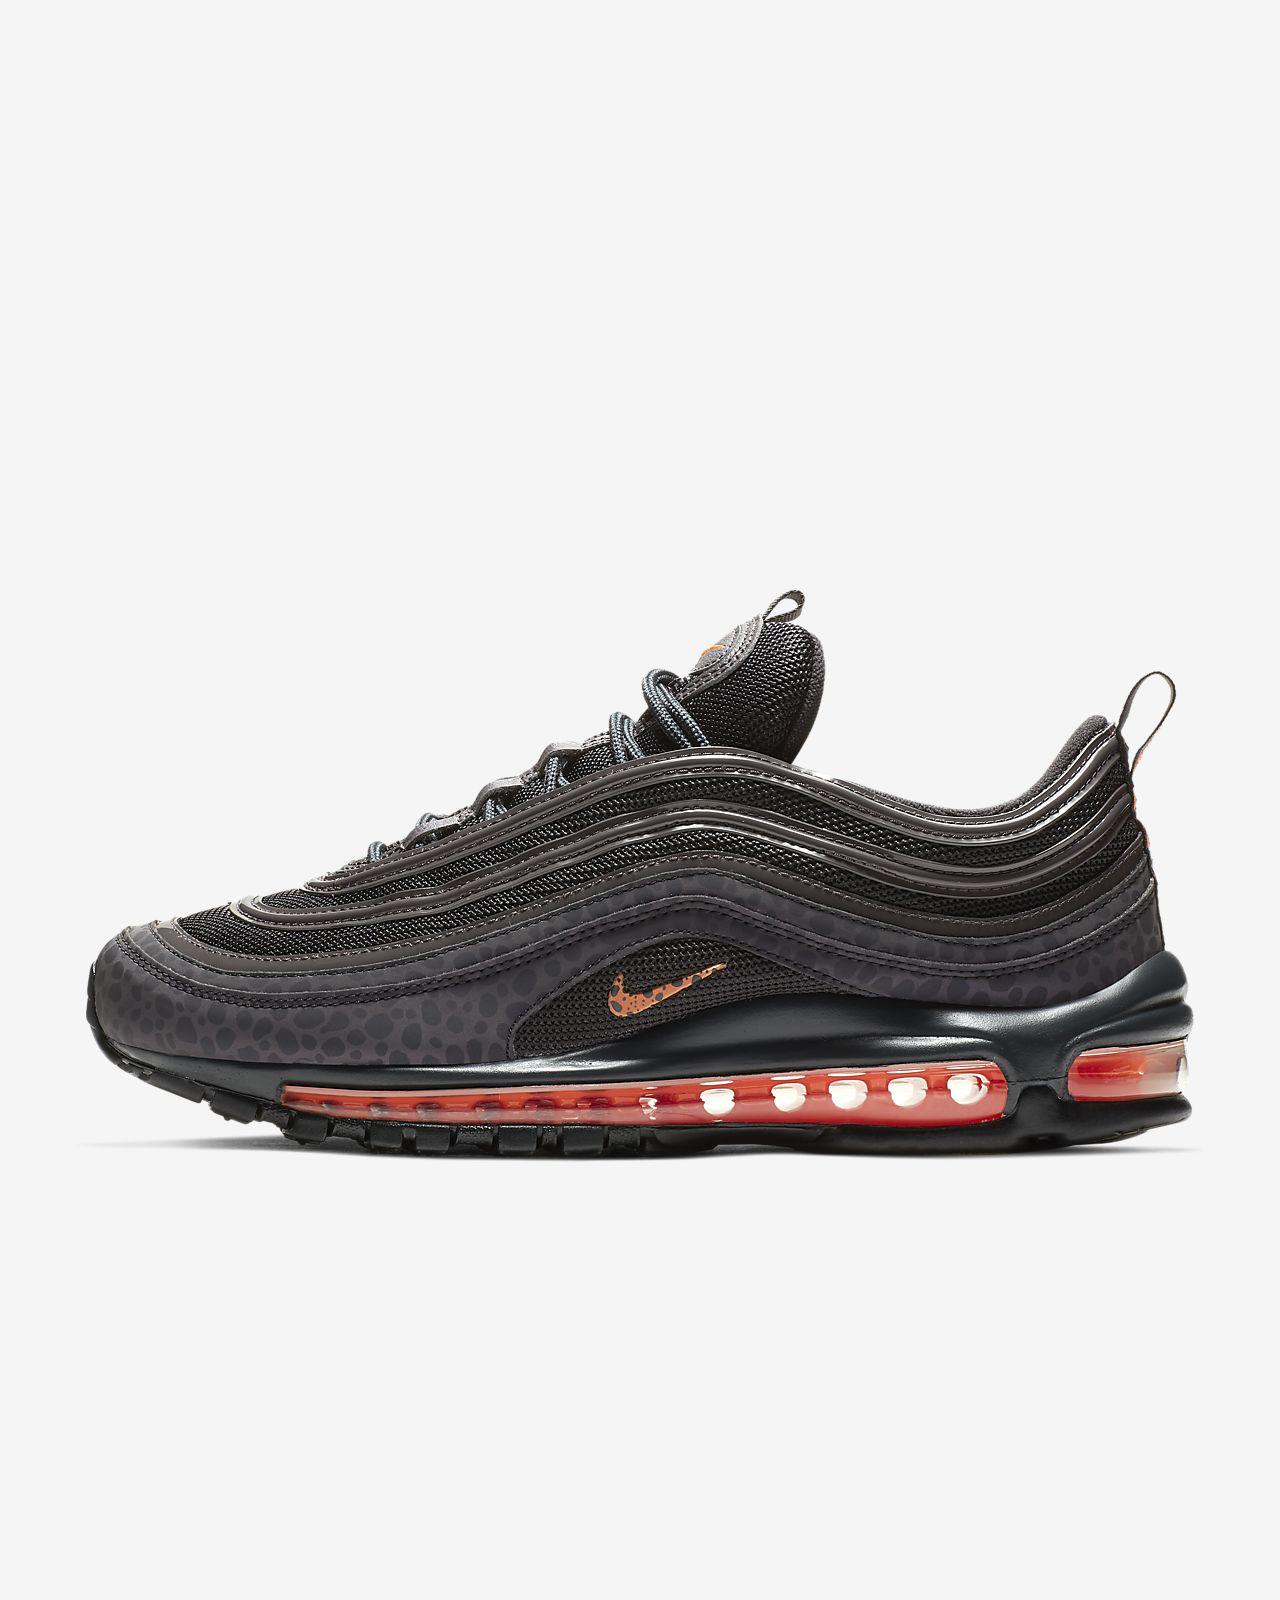 timeless design 0b881 db8ca ... Nike Air Max 97 SE Reflective sko til herre